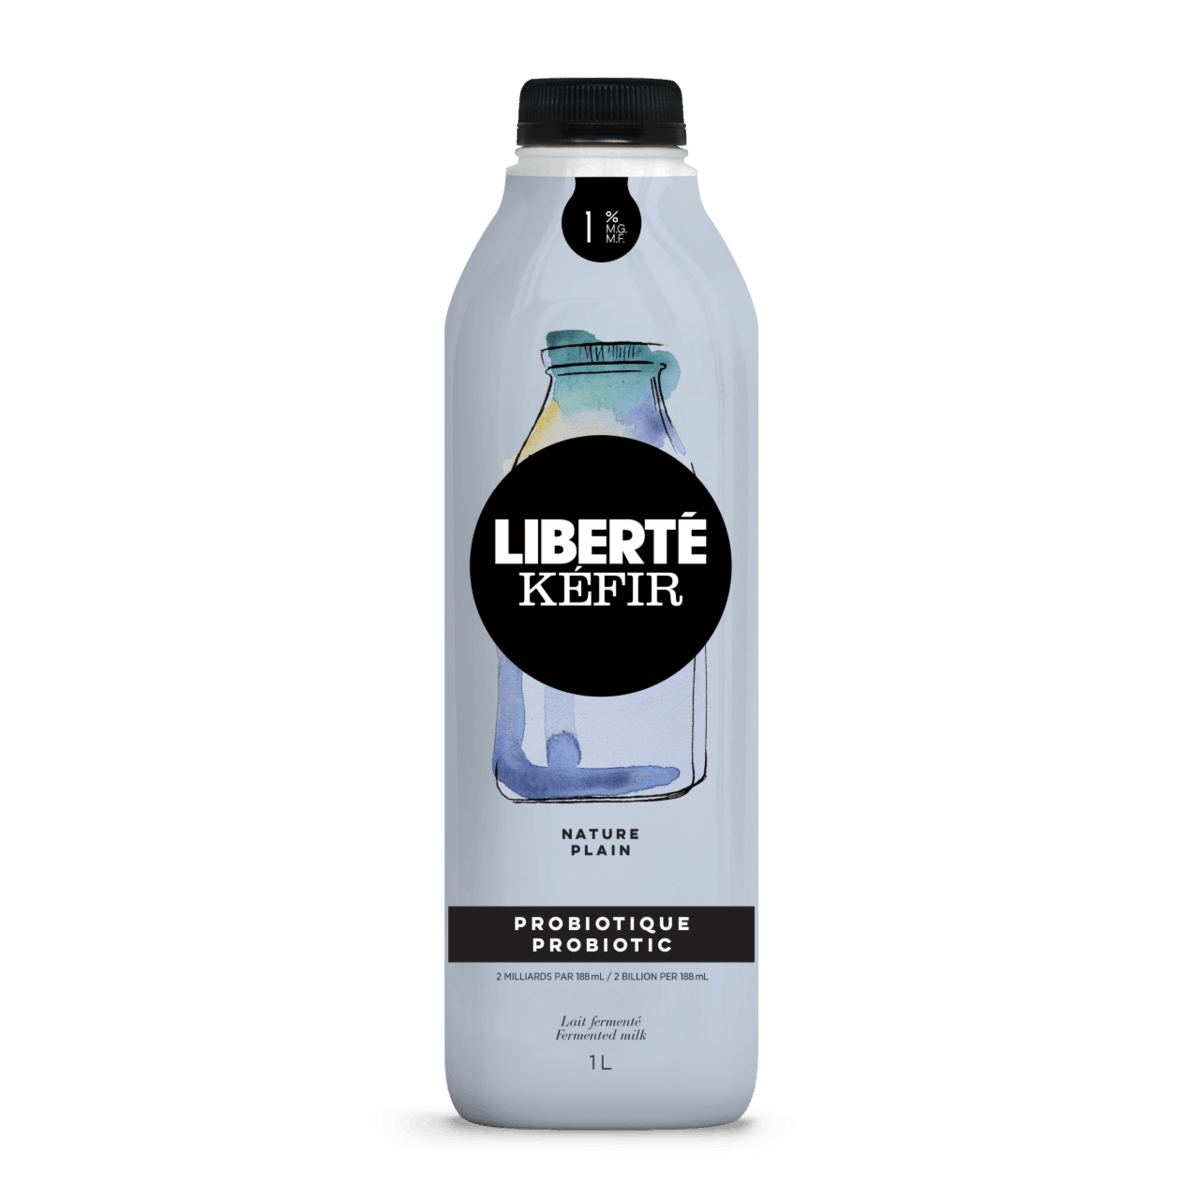 A container of Liberté Kefir.